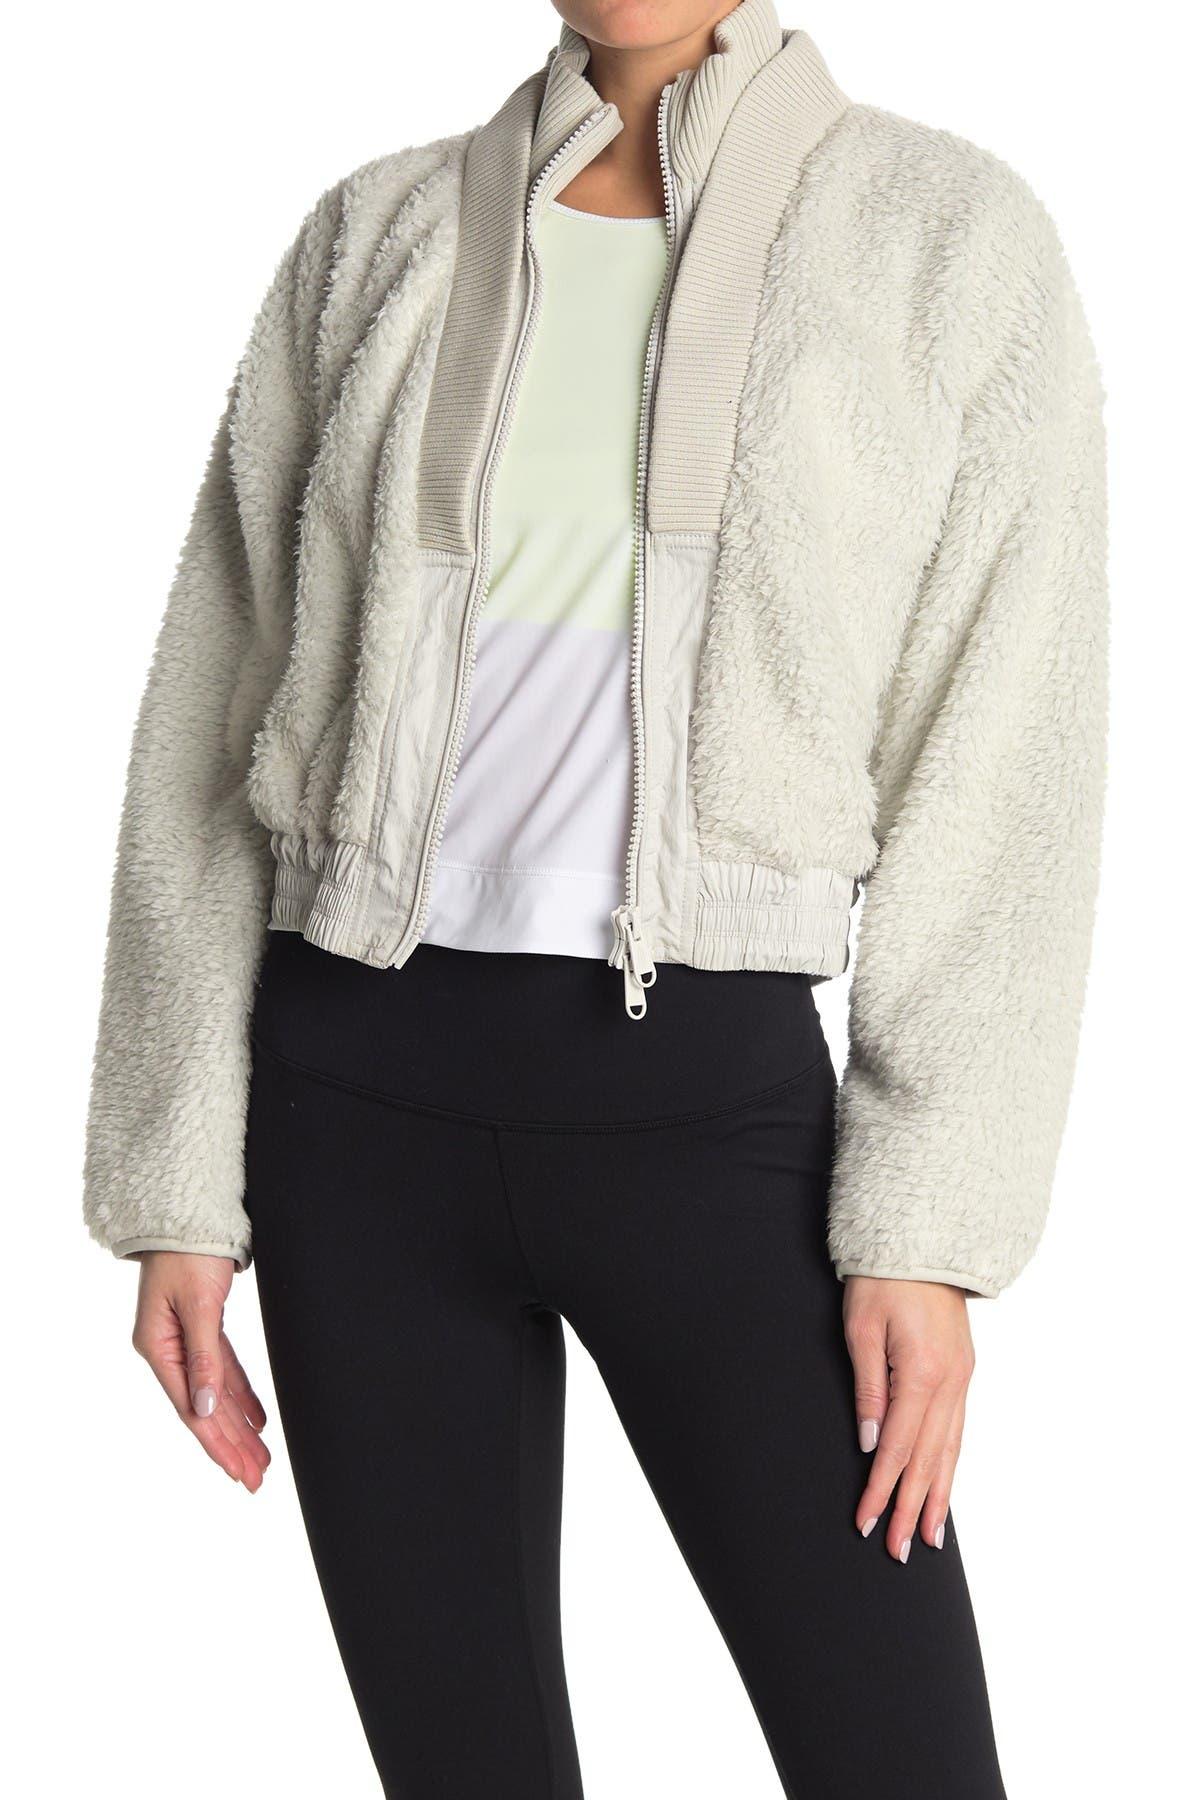 Image of Free People Gear Up Fleece Jacket